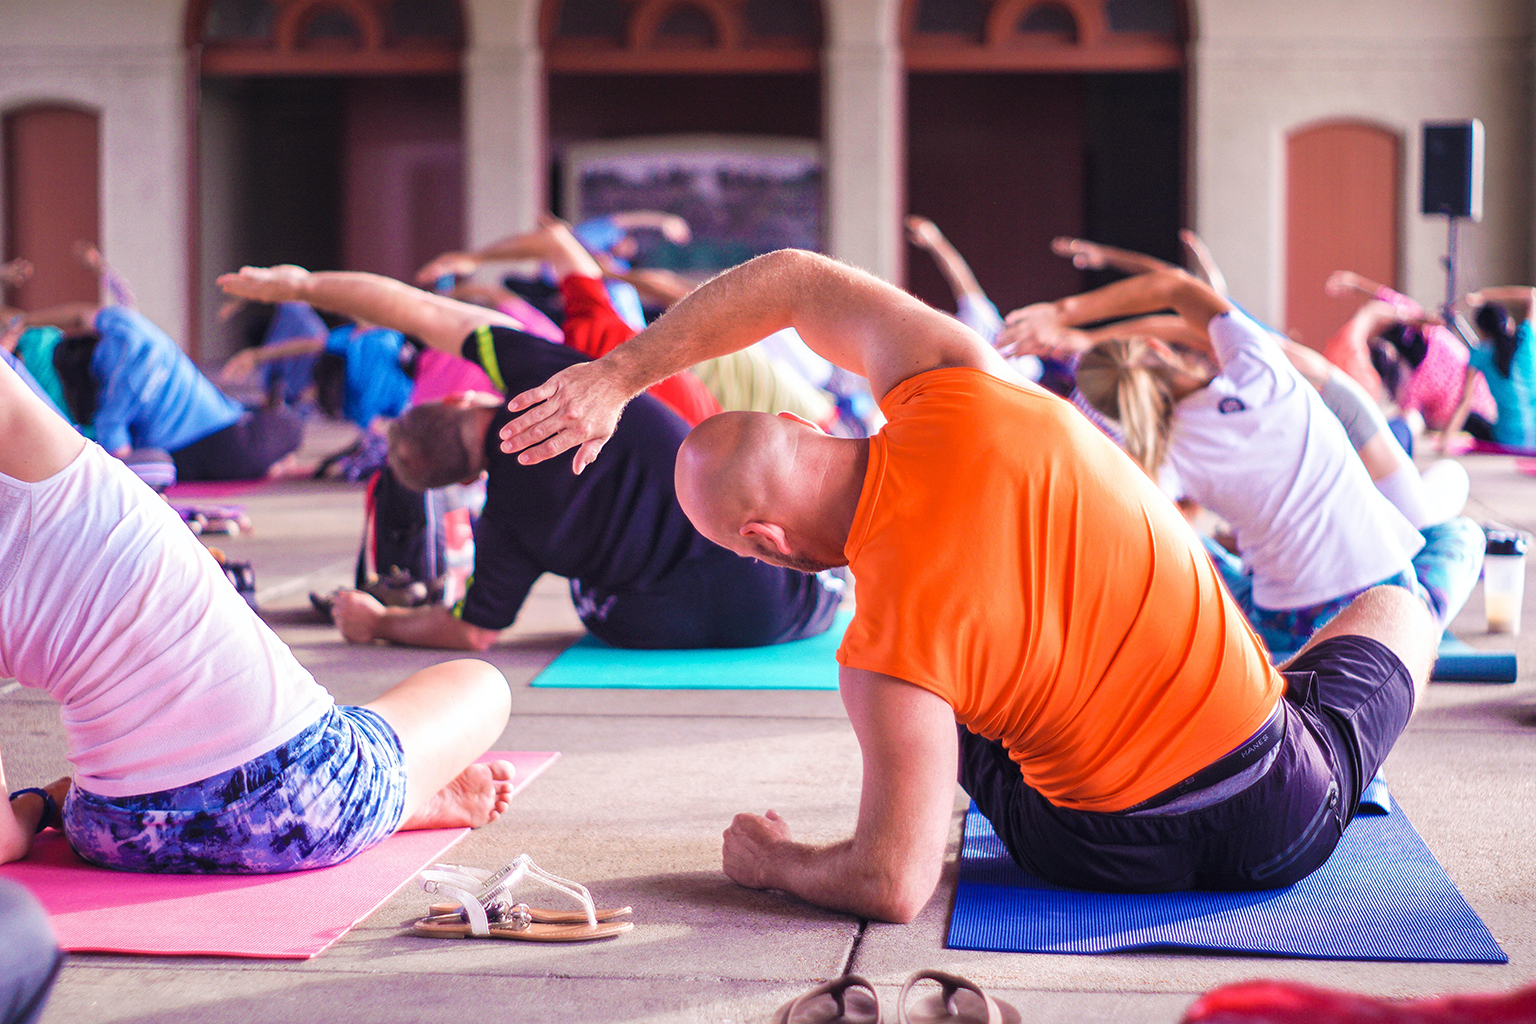 Yoga class sitting on their mats, stretching